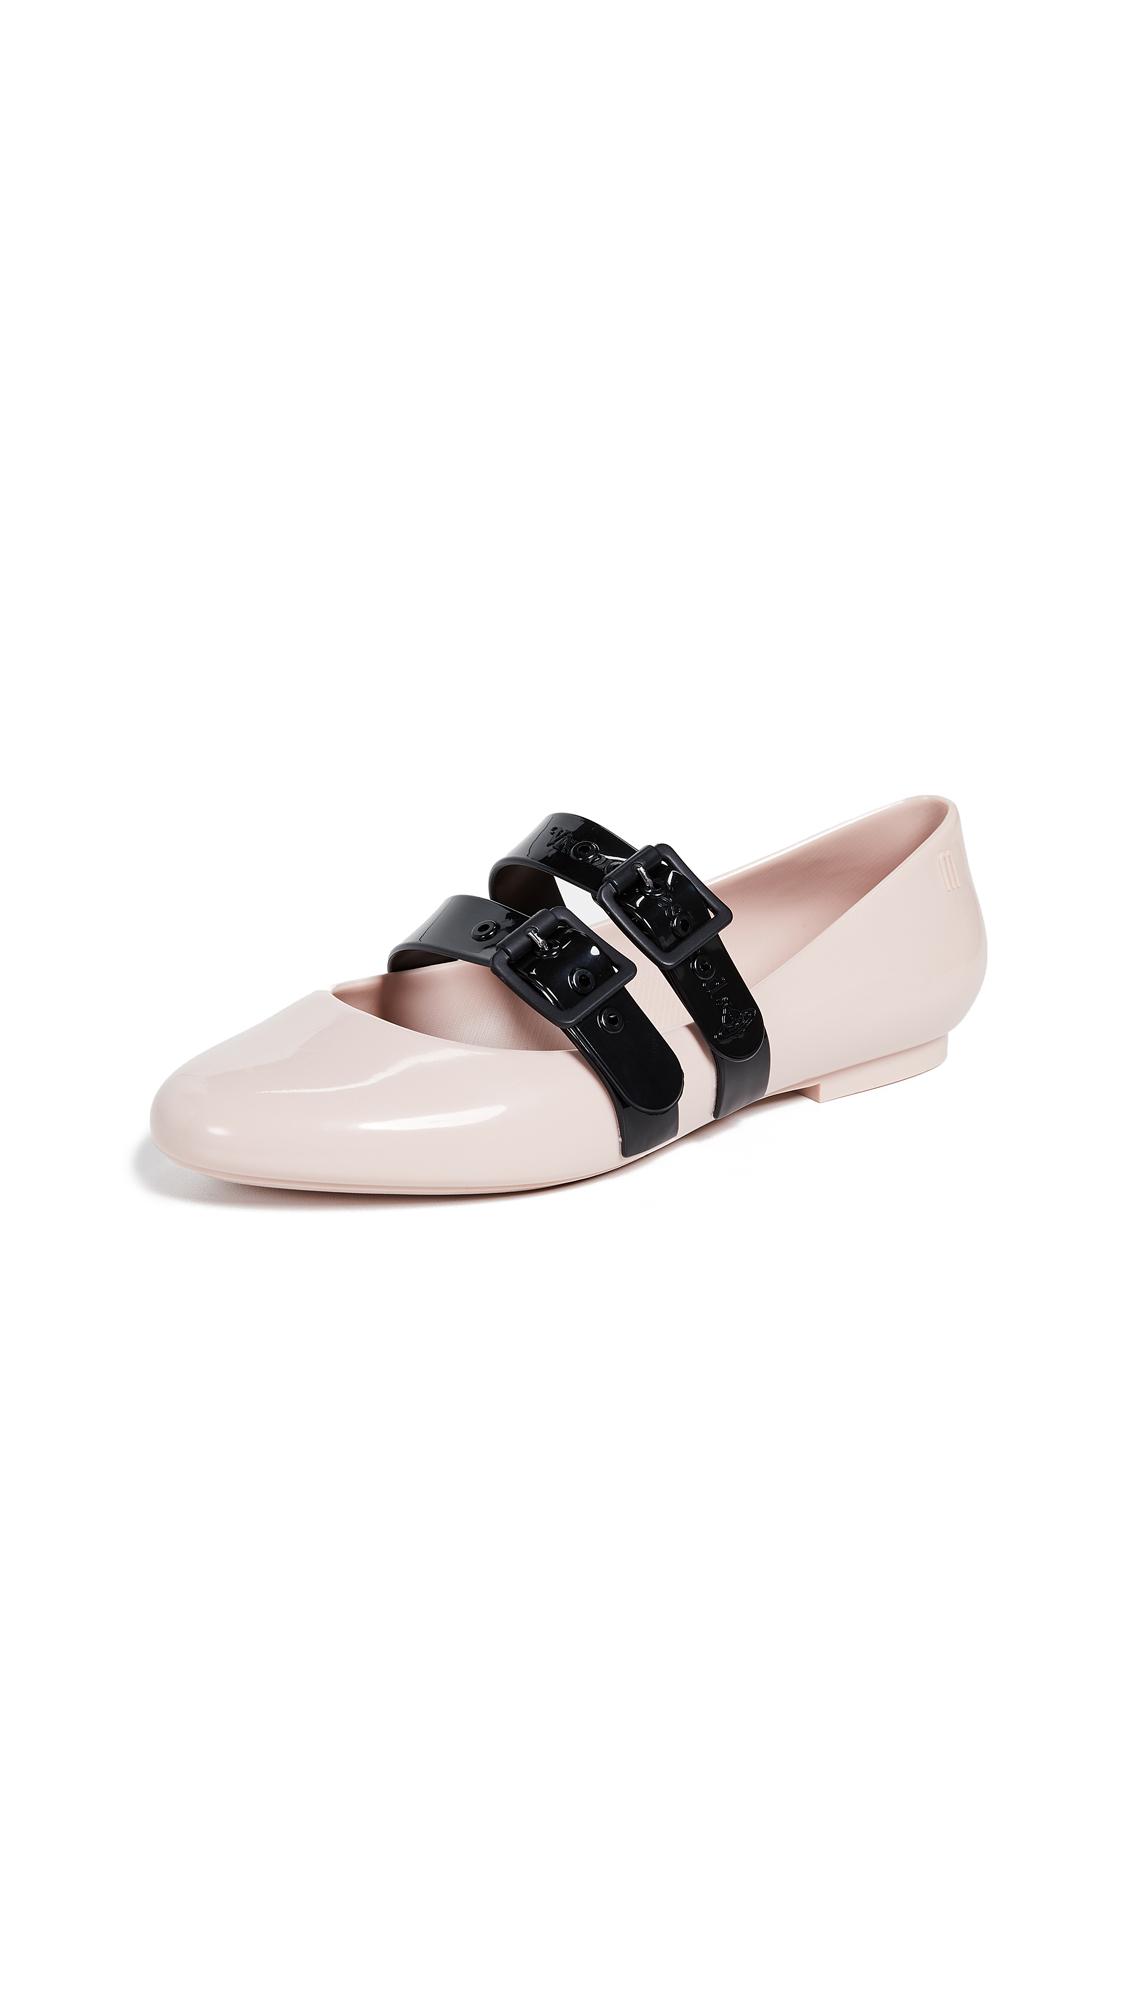 Melissa x Vivienne Westwood Doll Flats - Pink/Black